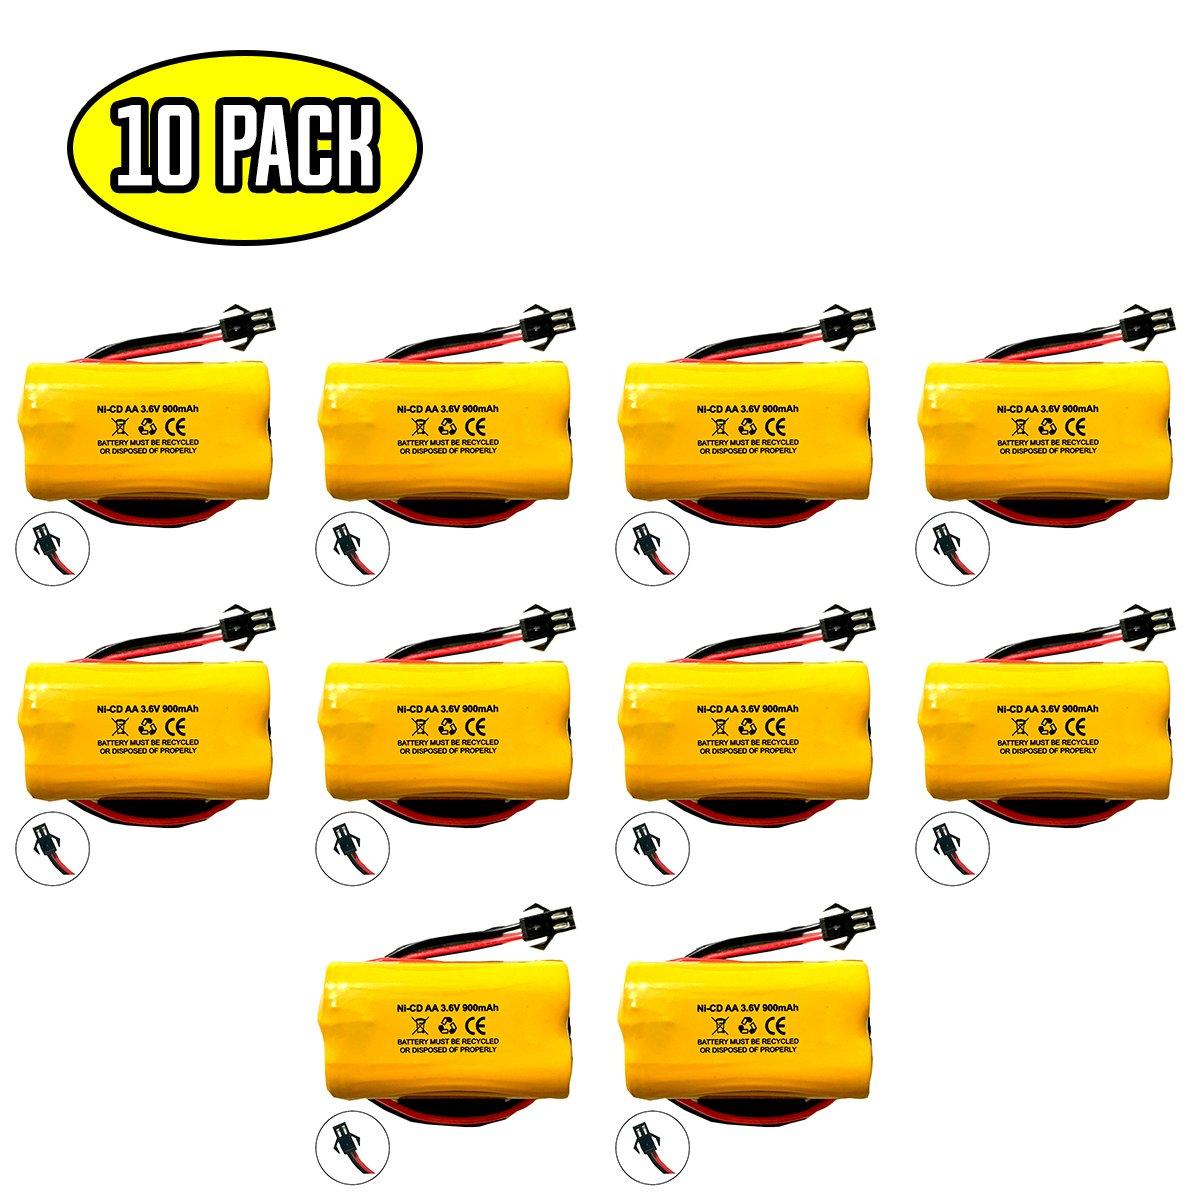 (10 pack) Exit Sign Emergency Light NiCad Battery 3.6v 900mAh Replacement Lithonia ELB B001 ELBB001 ELB-B001 Unitech AA900MAH Lithonia EU2 LED Interstate ANIC1566 Unitech 0253799 Battery Hawk